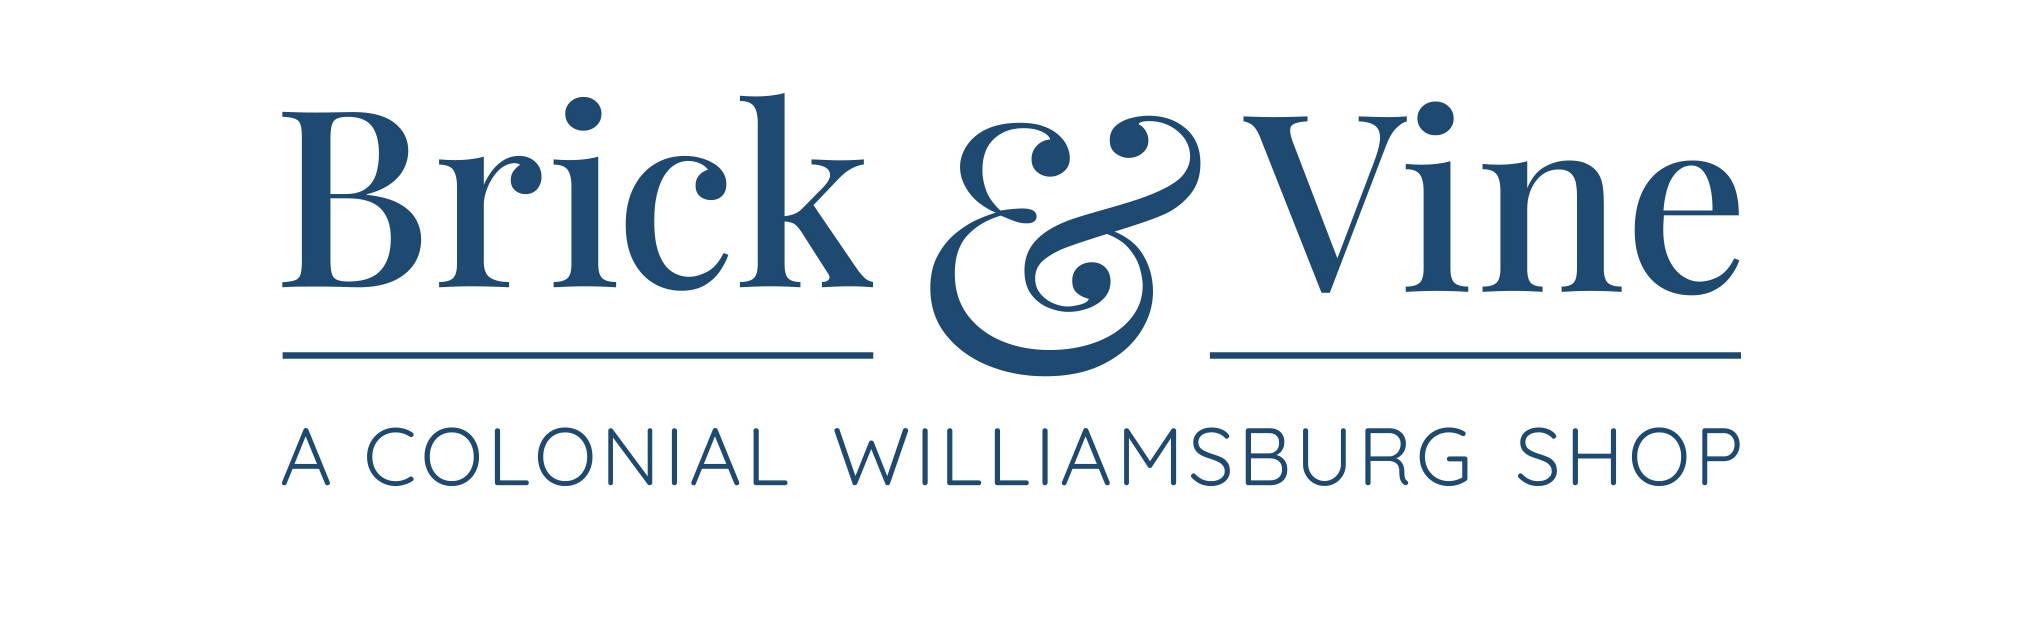 Brick & Vine: A Colonial Williamsburg Shop